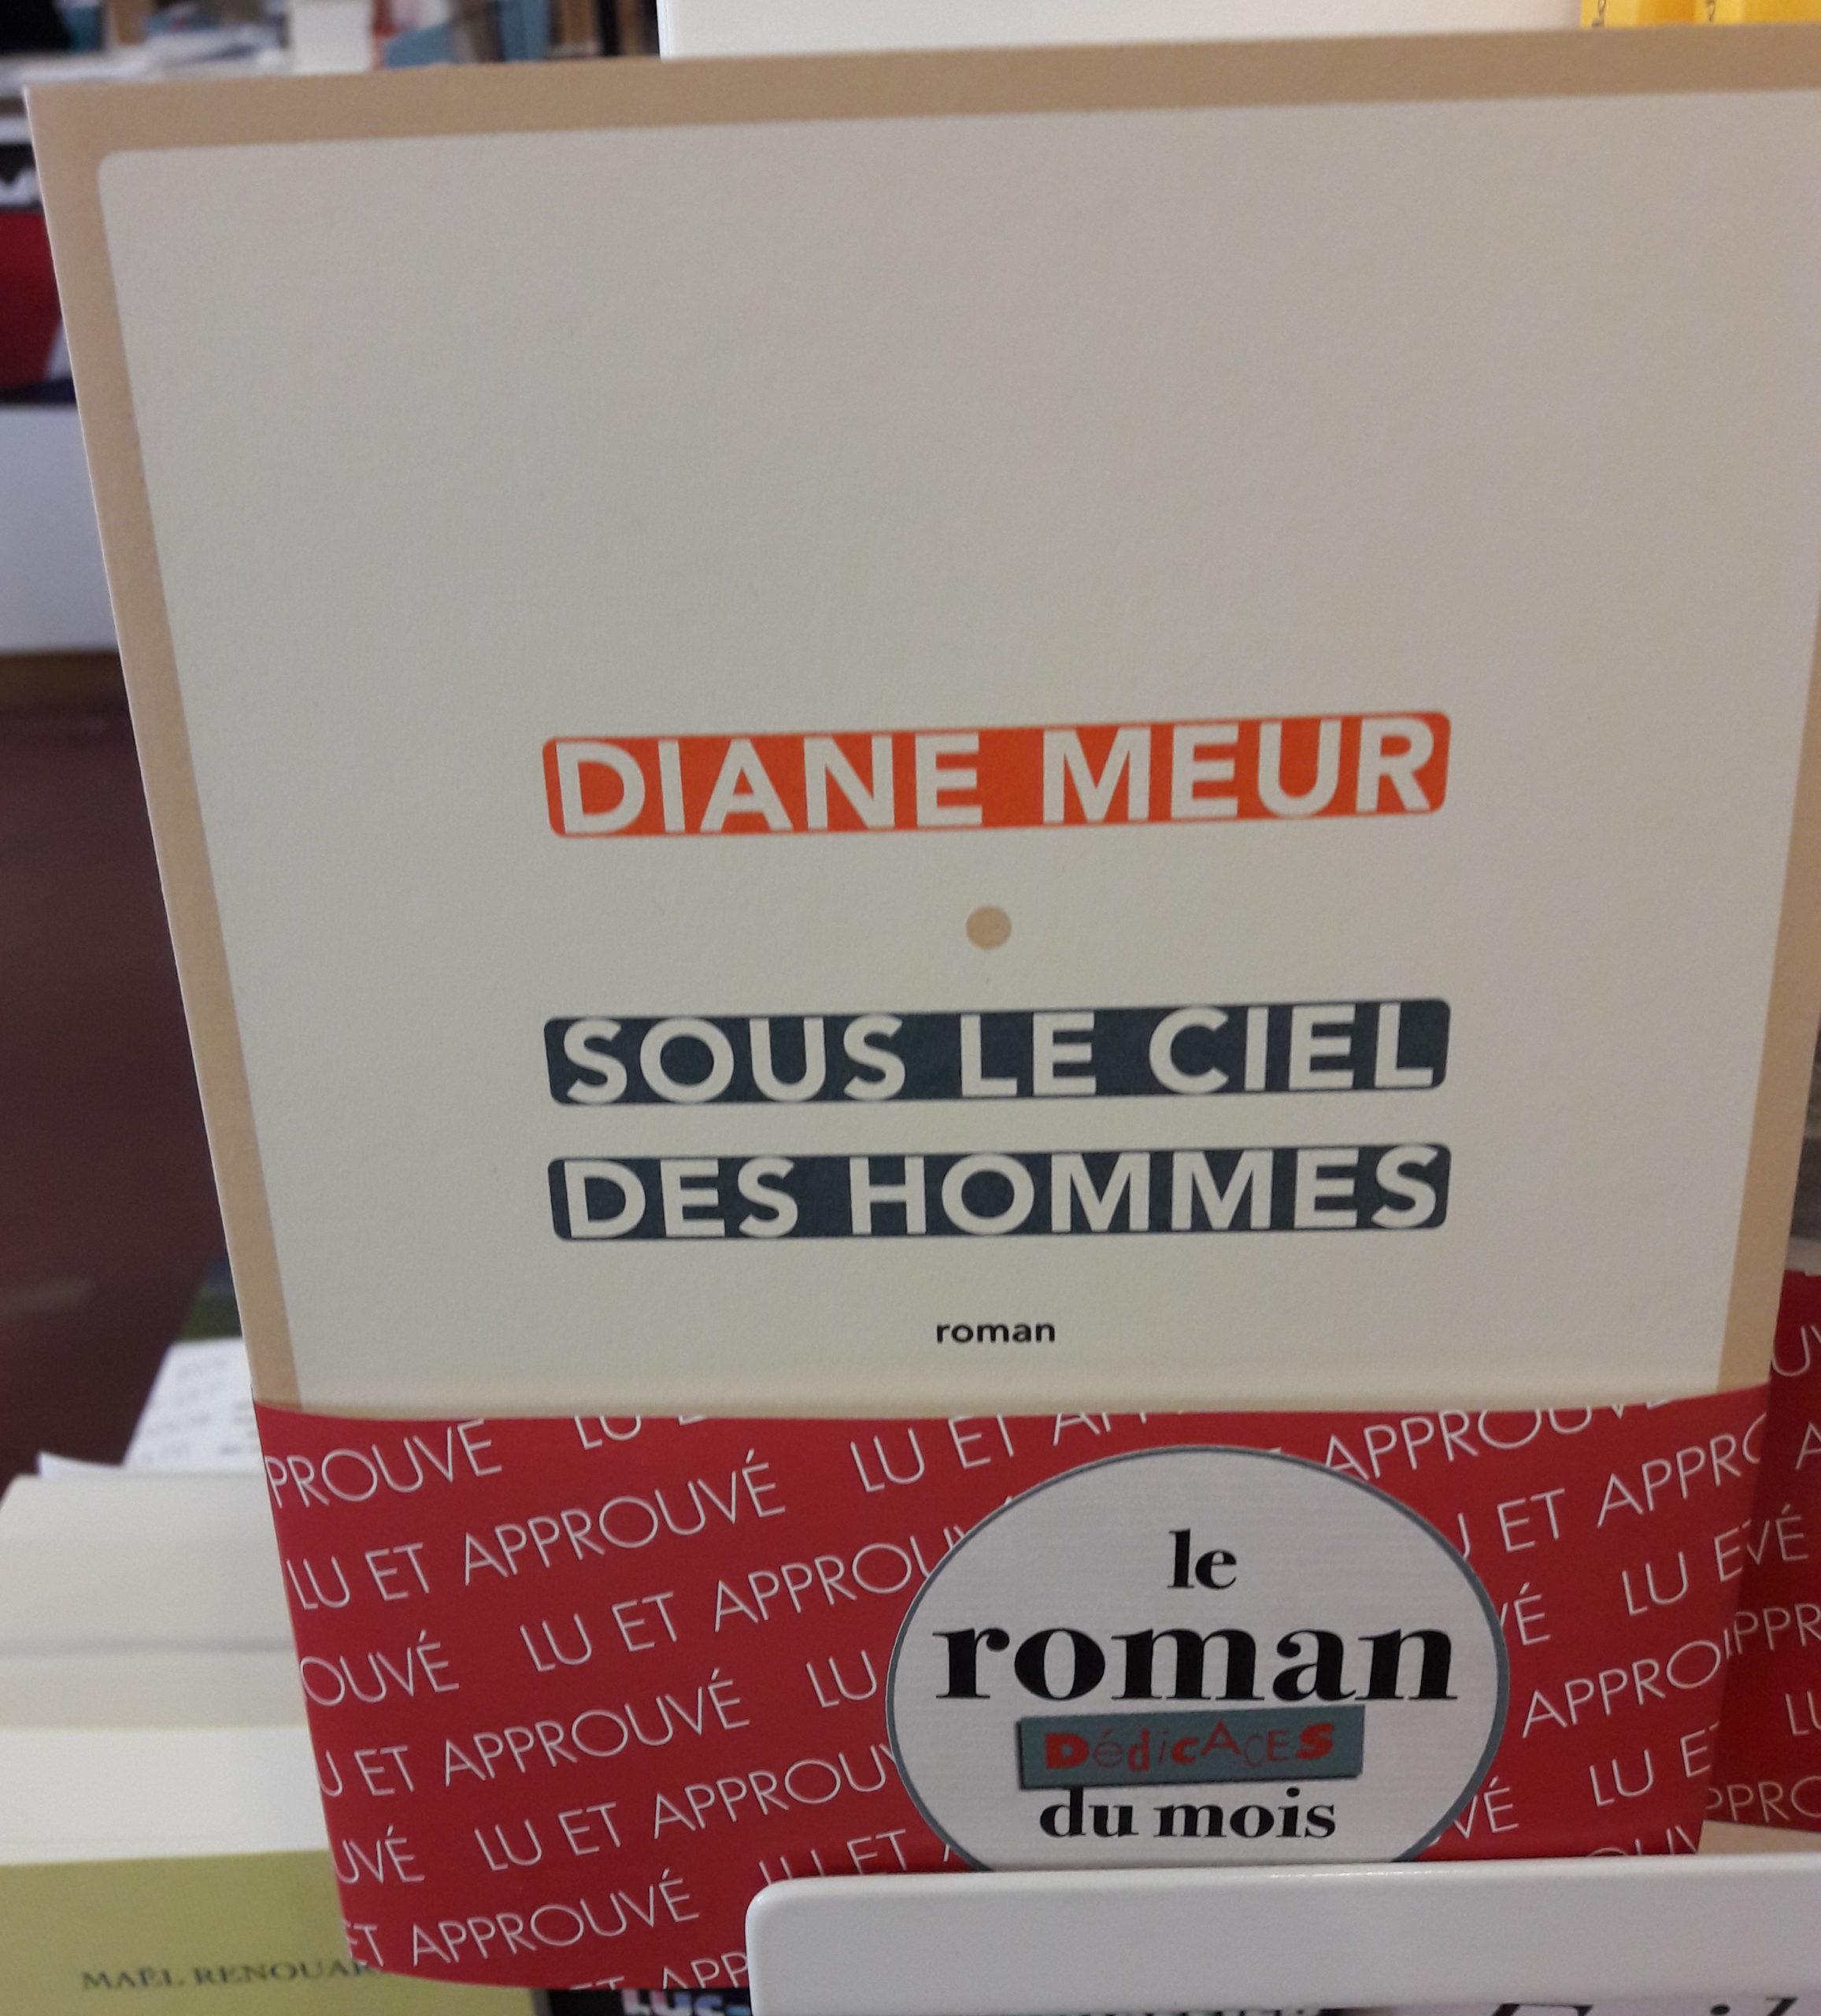 rencontre gay rights à Rueil-Malmaison